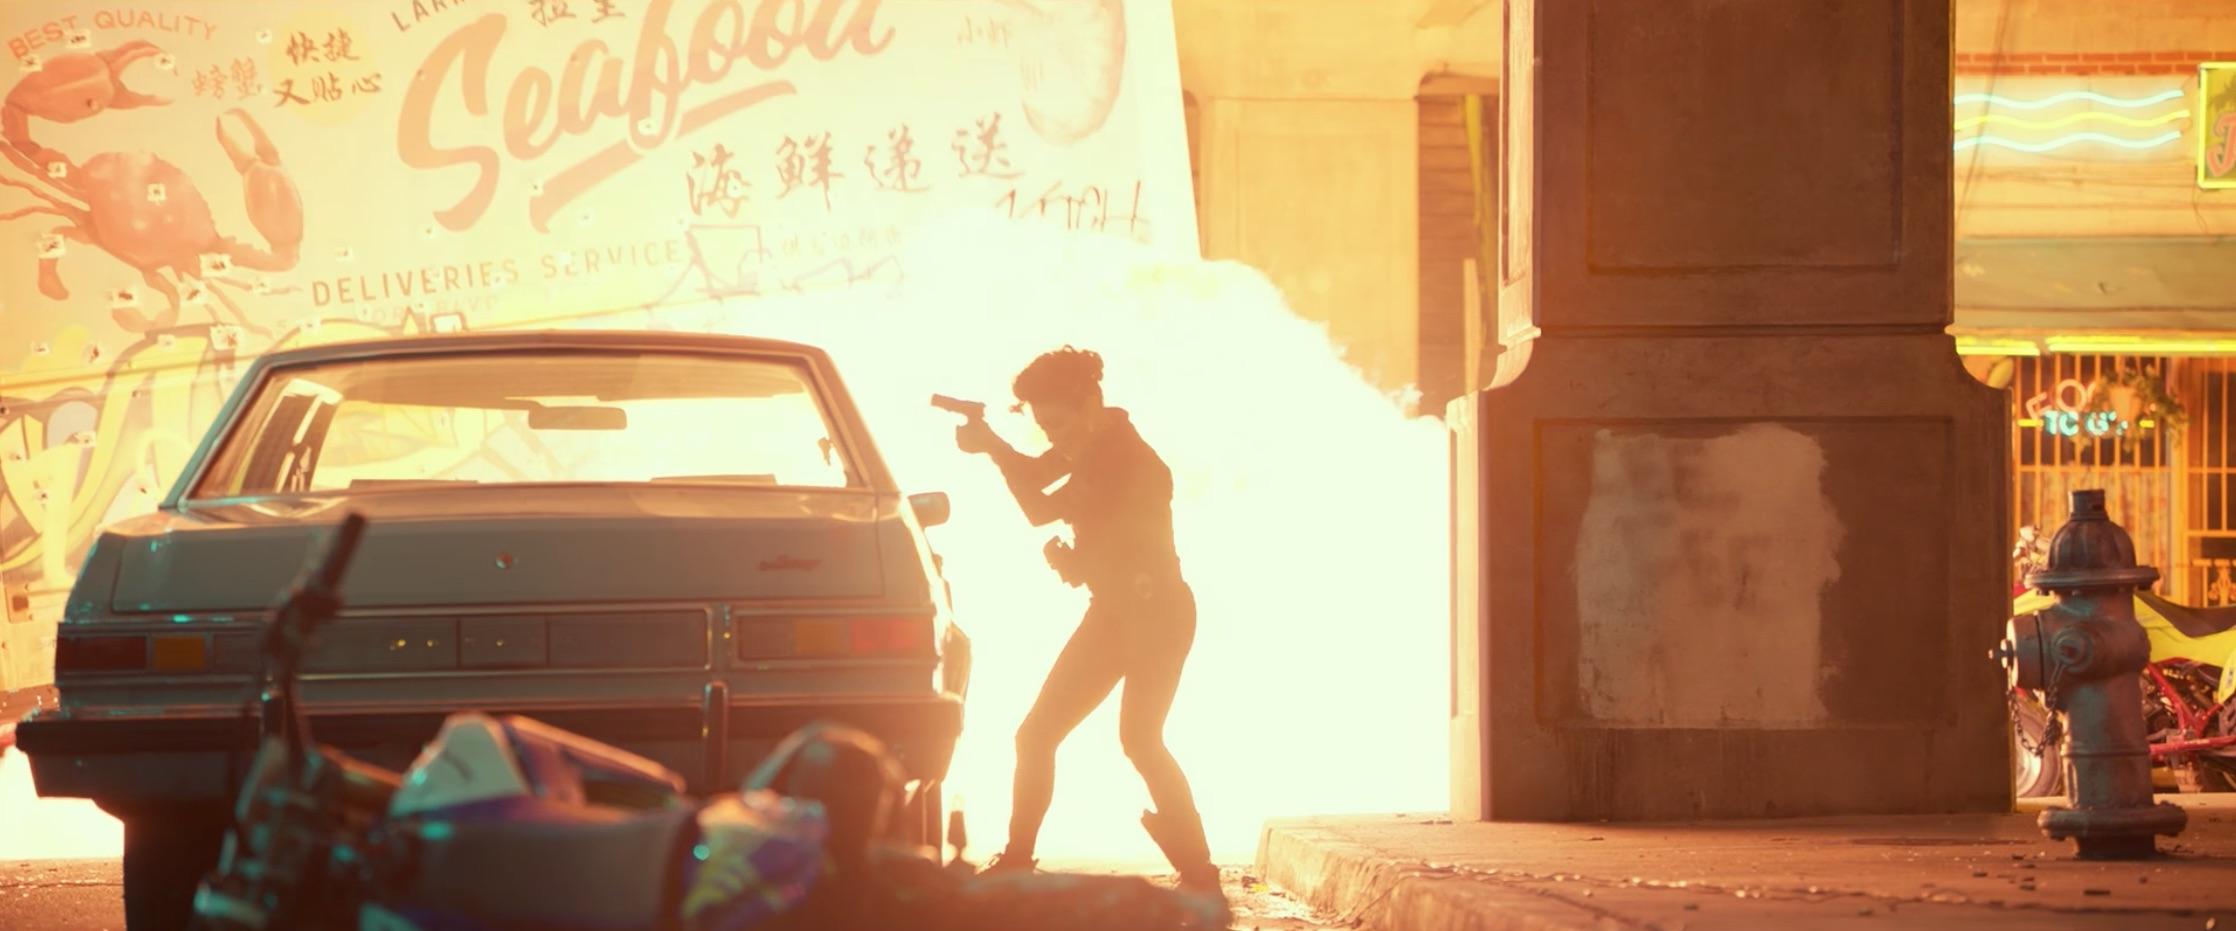 Bad Boys For Life gunman reloading near flame